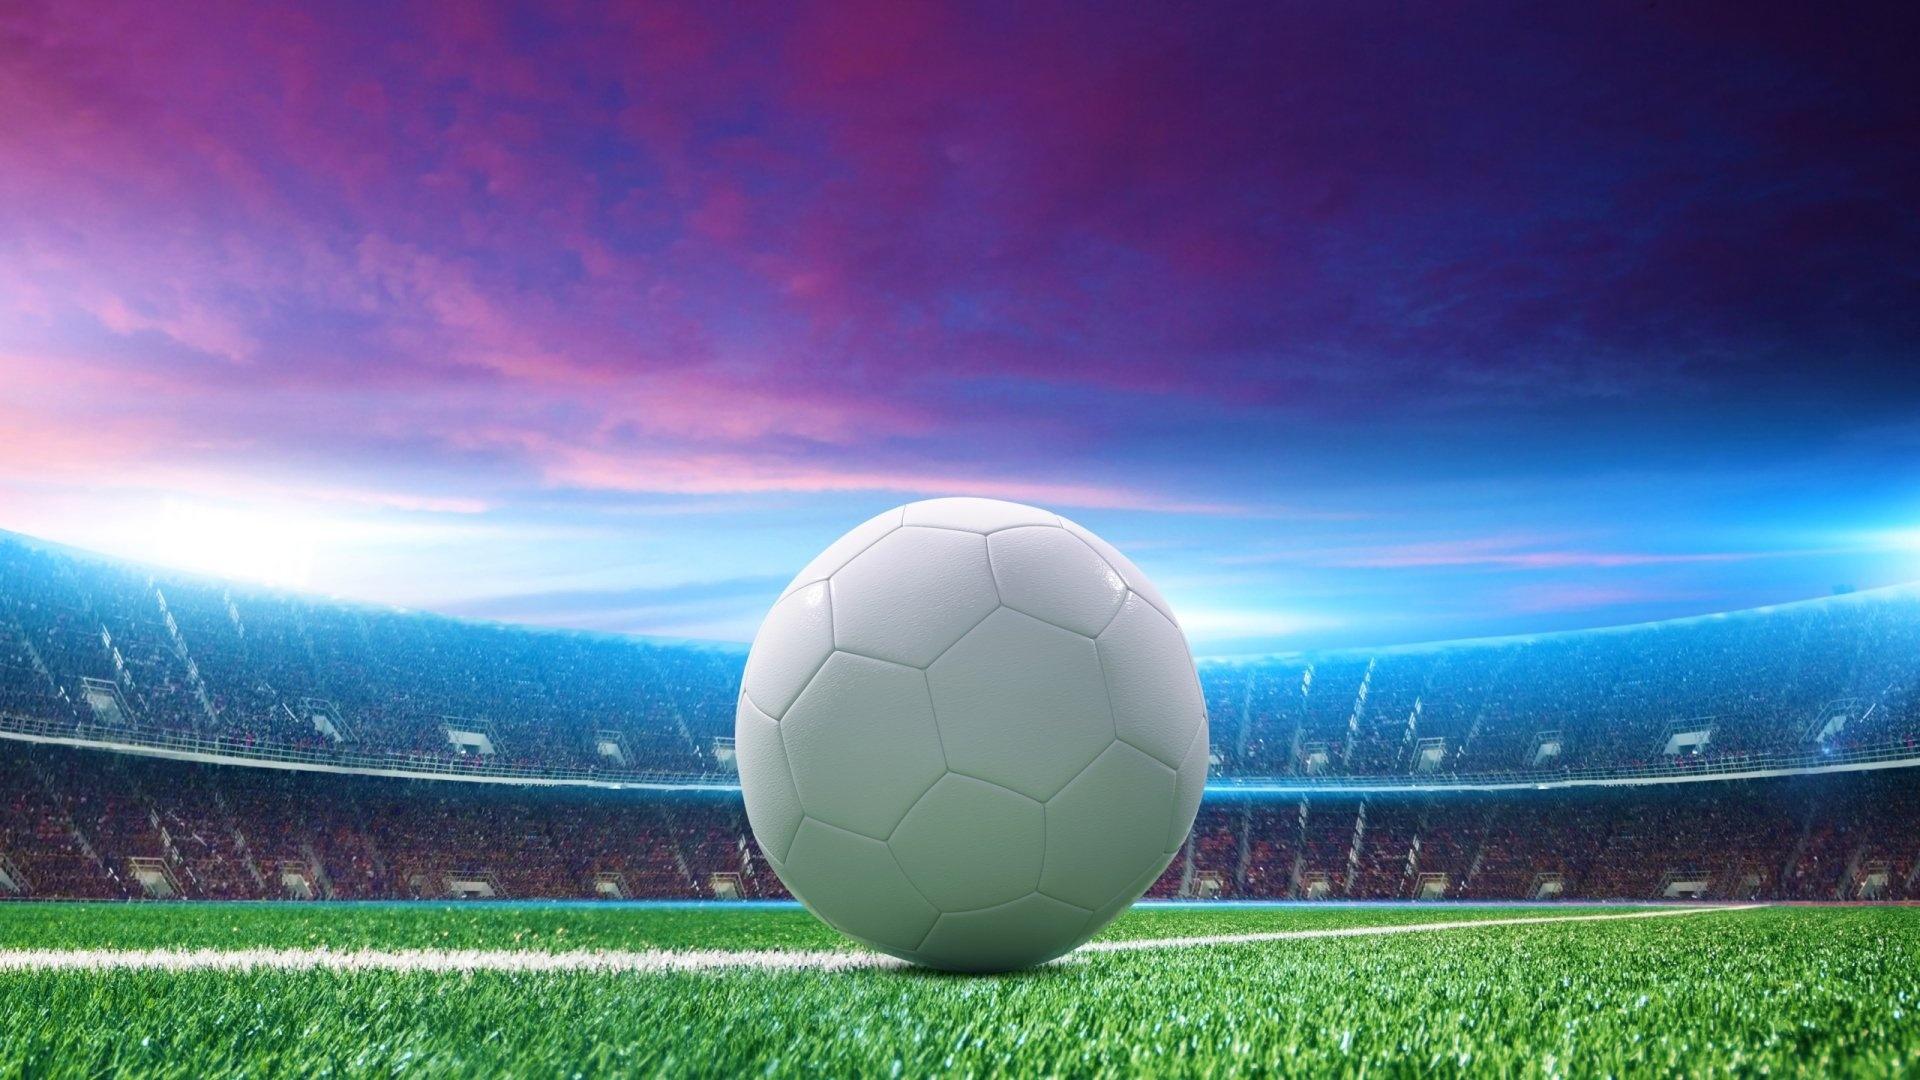 Soccer cool wallpaper